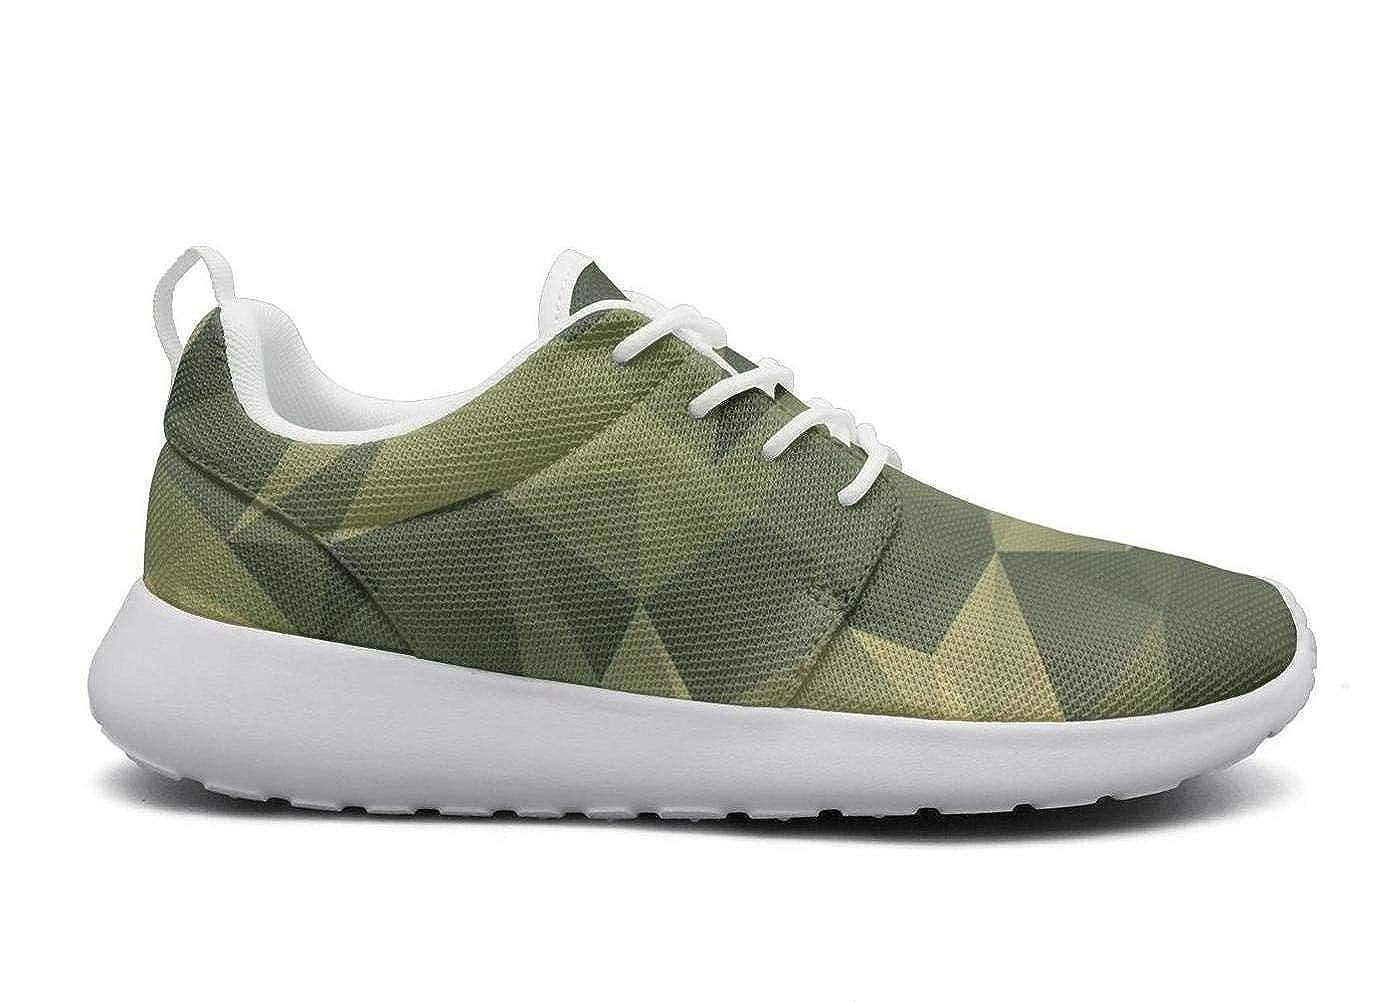 Usa map desert digital camo Walking Shoes for Women Lo-Top Lightweight Running Shoes